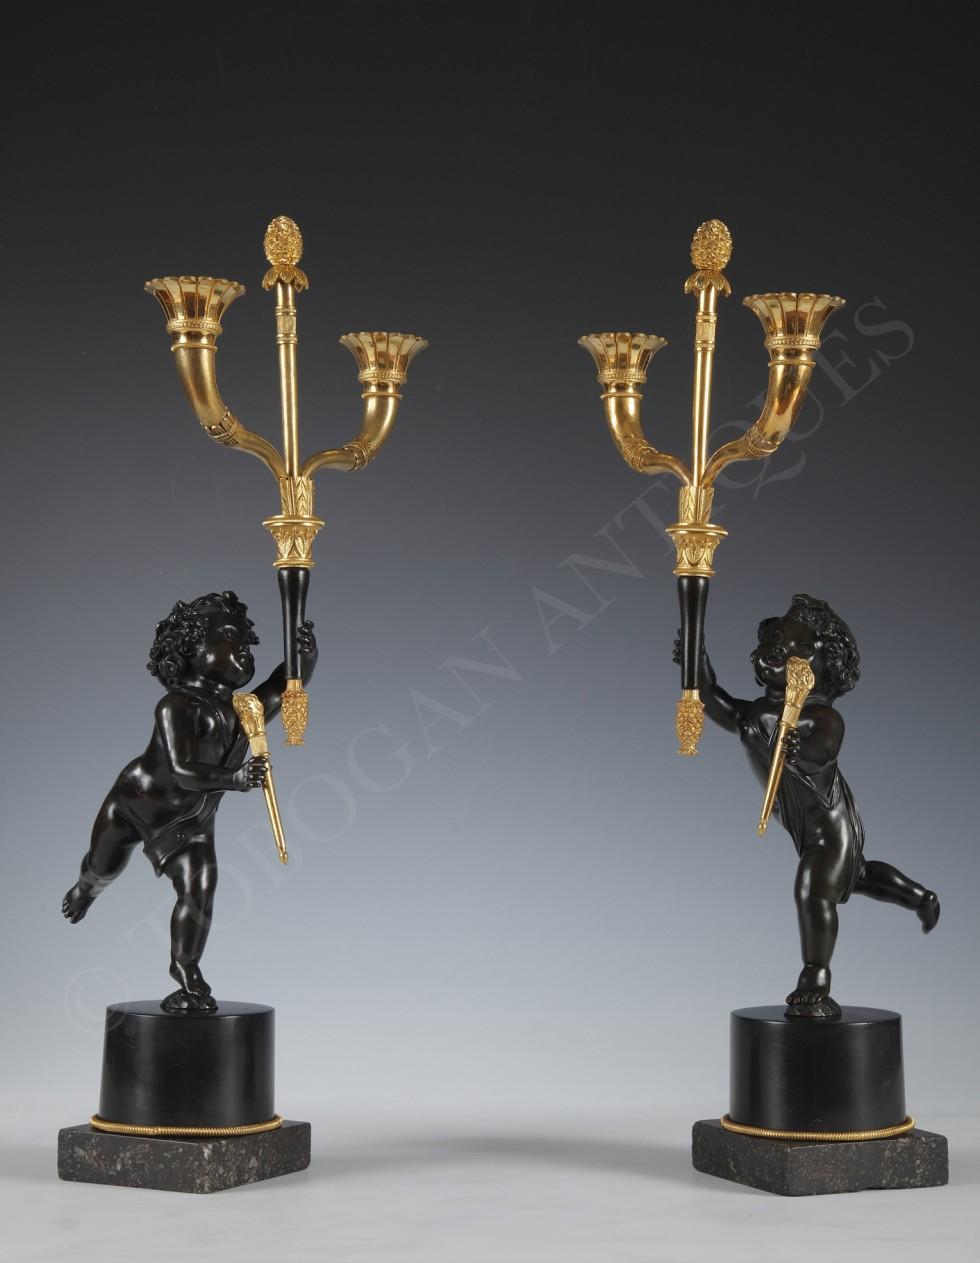 A lovely pair of cherub candelabra